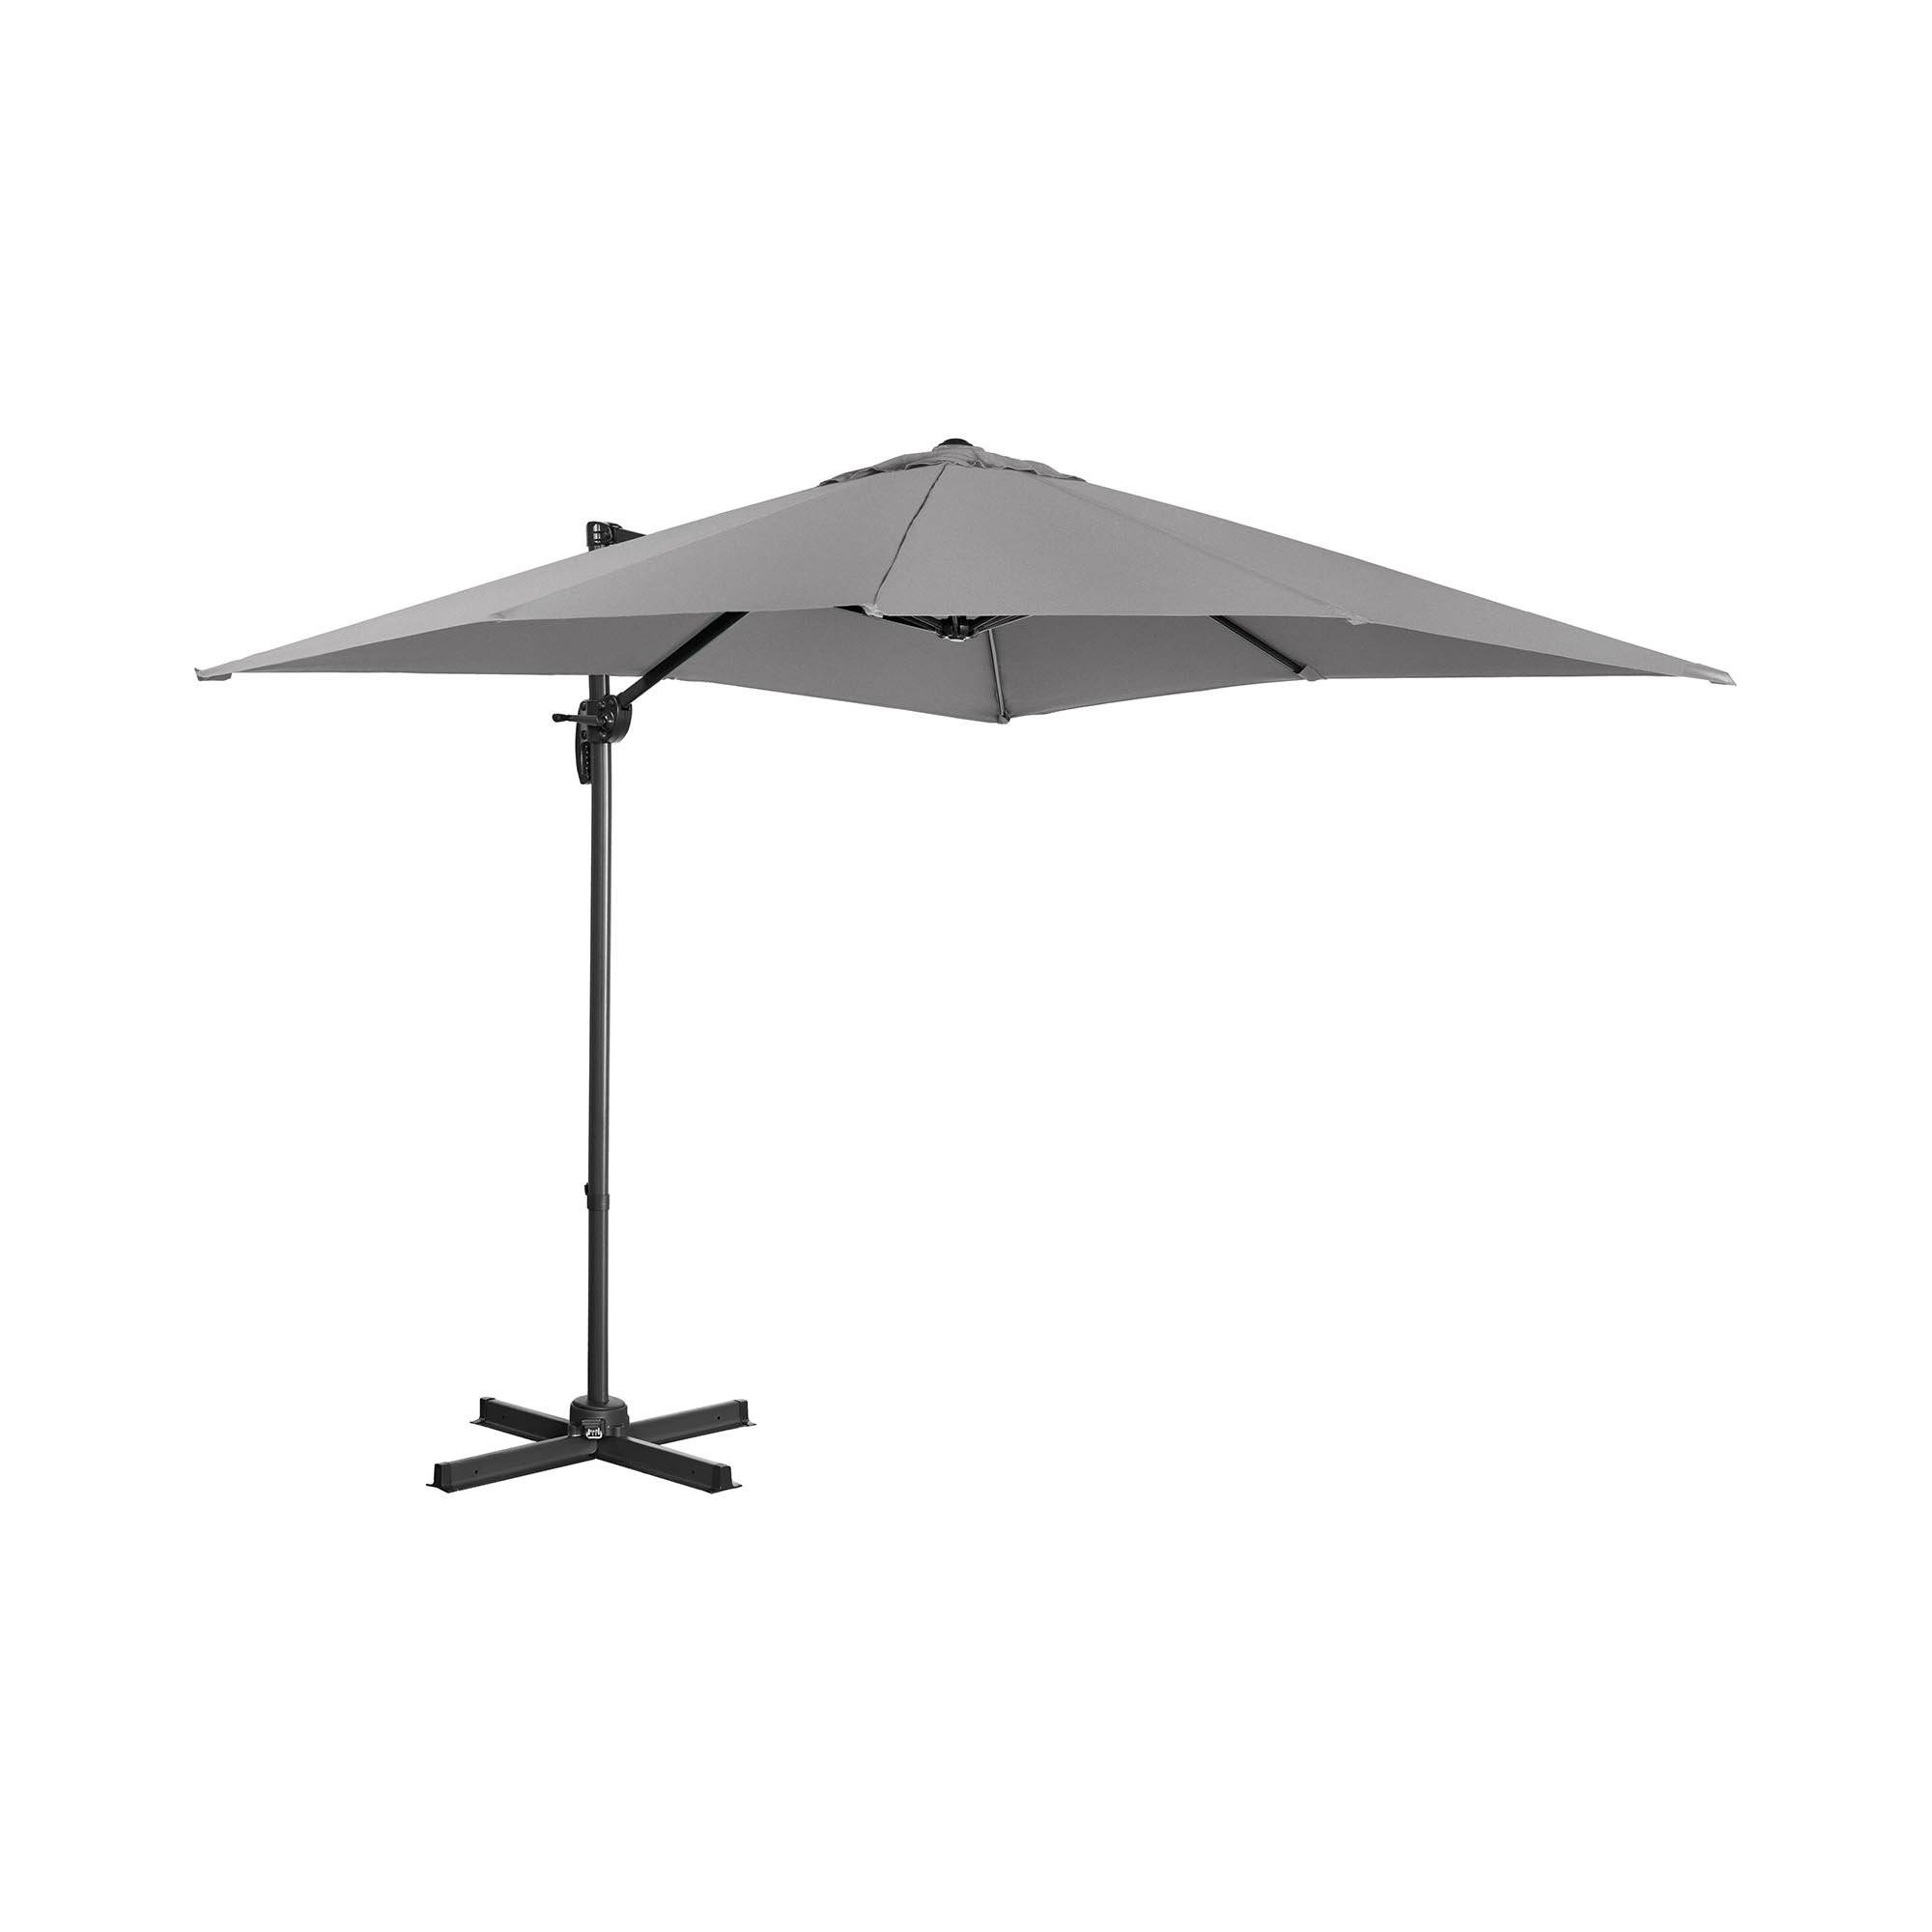 Uniprodo Hængeparasol - mørkegrå - firkantet - 250 cm i diameter - drejelig UNI_UMBRELLA_2SQ250DG